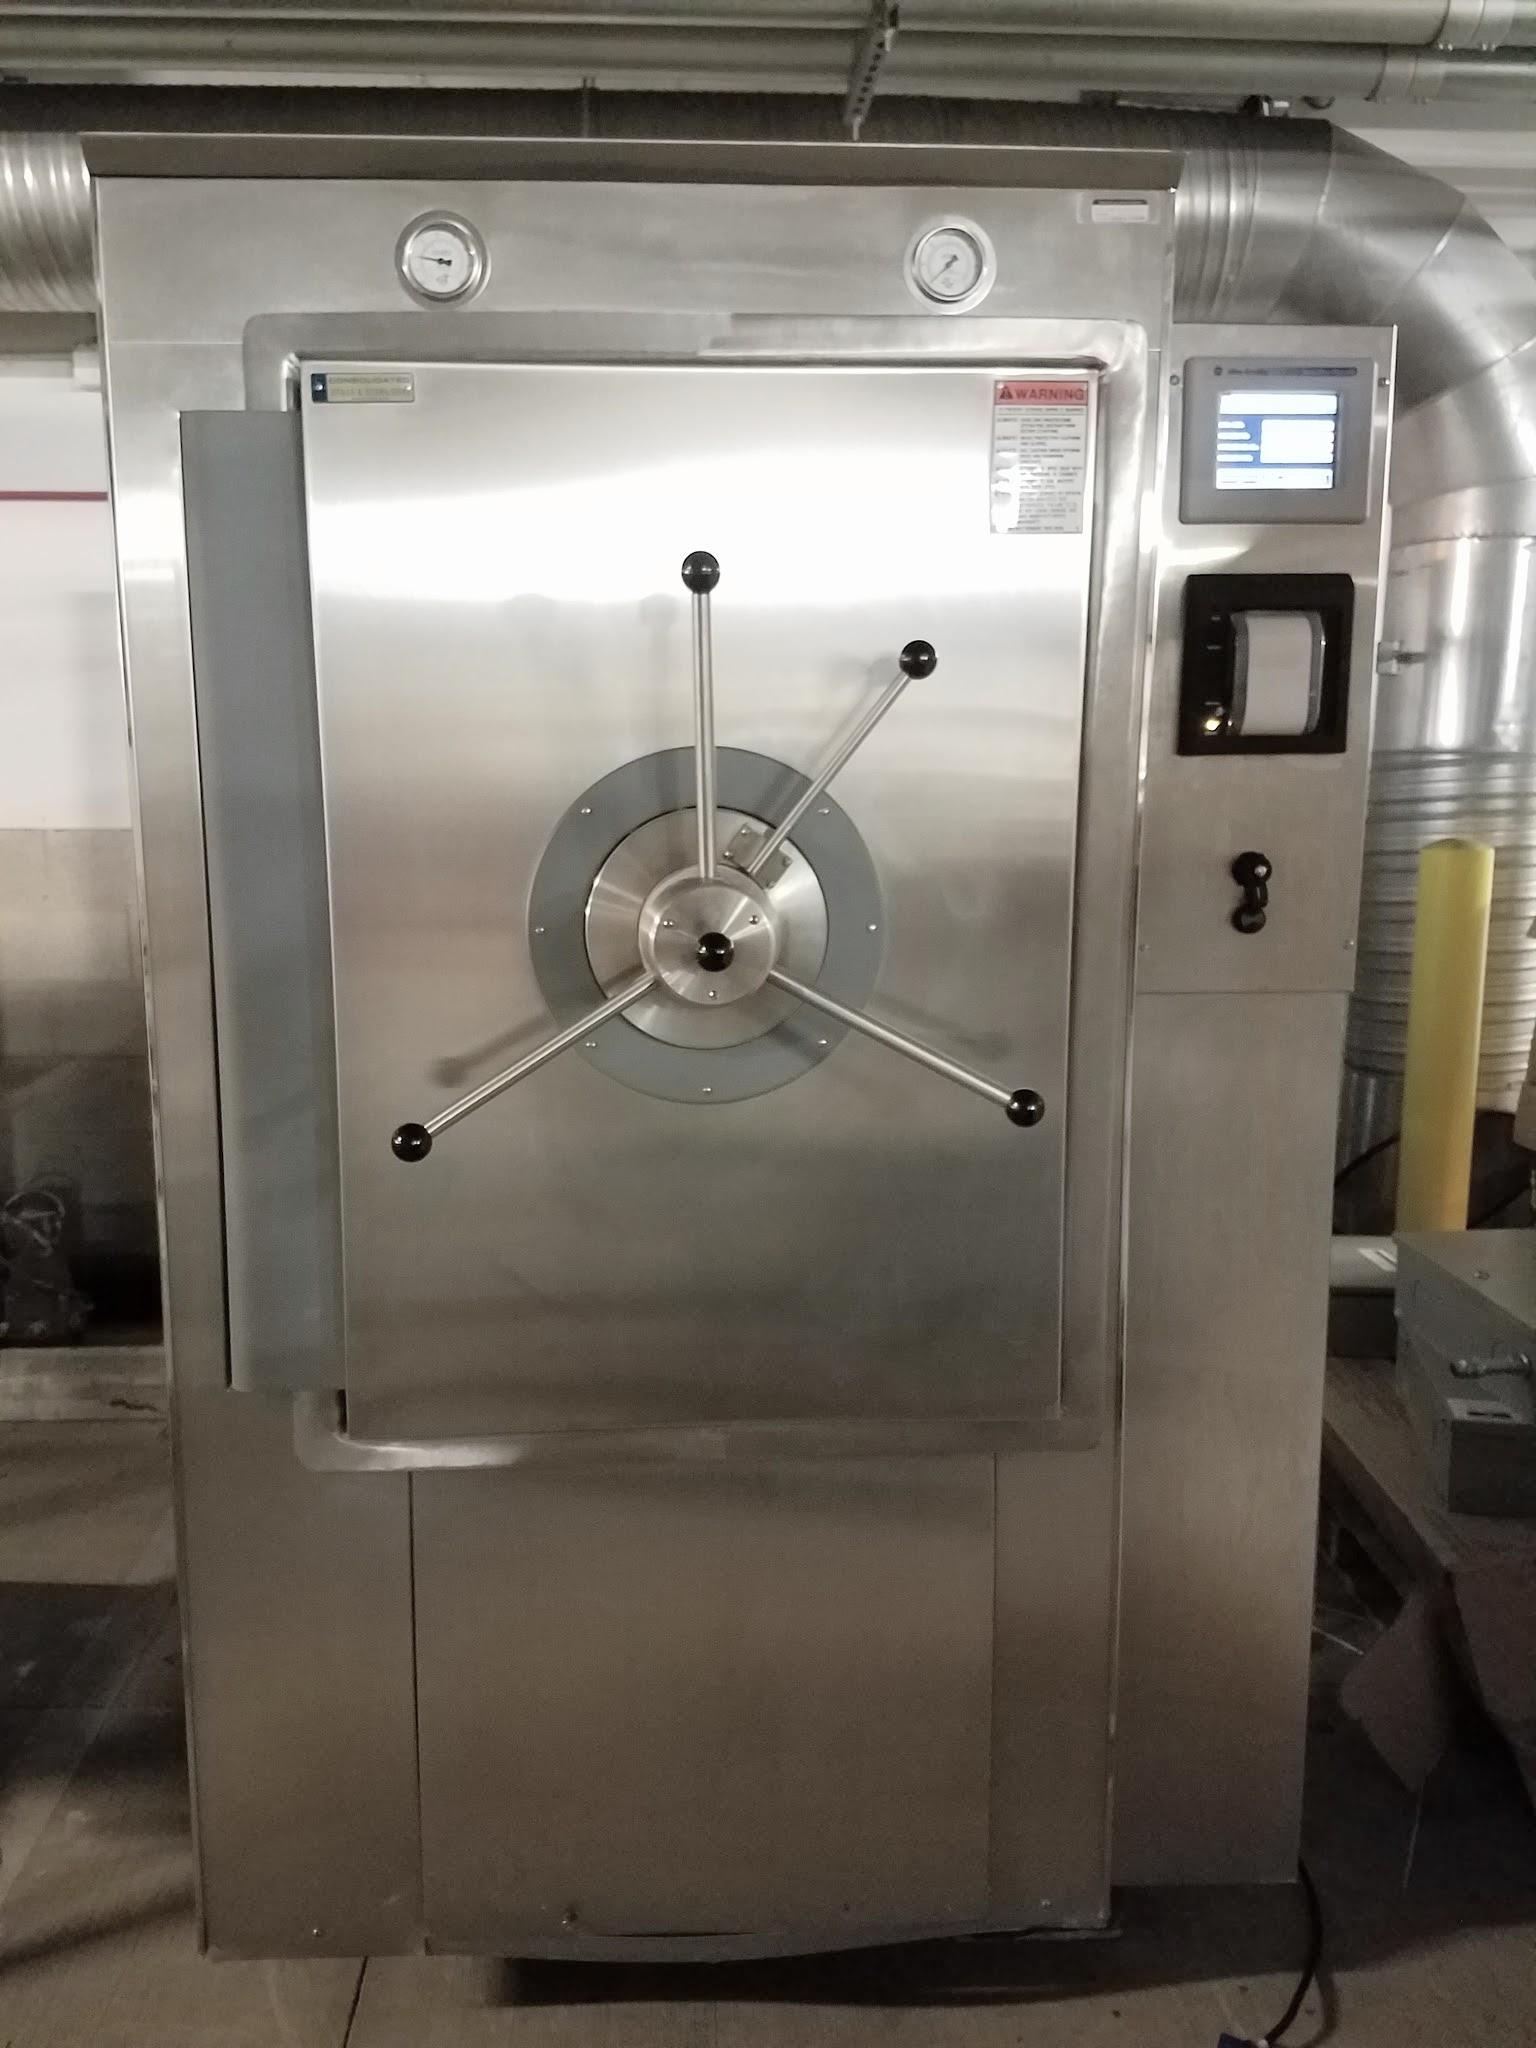 Refurbished Consolidated SR 24E S V Autoclave Sterilizer with